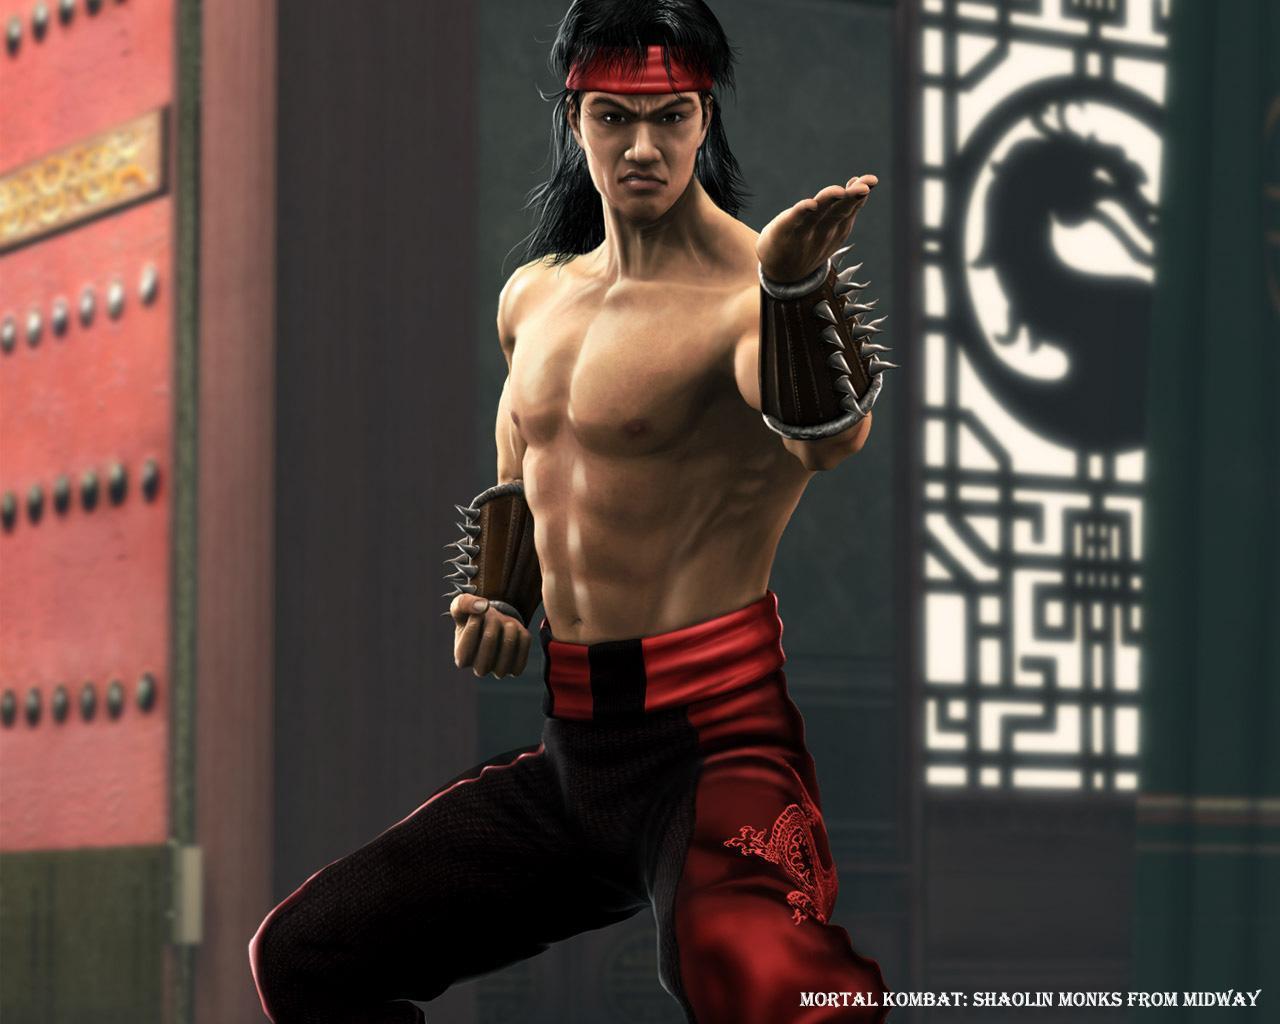 MK Shaolin Monks